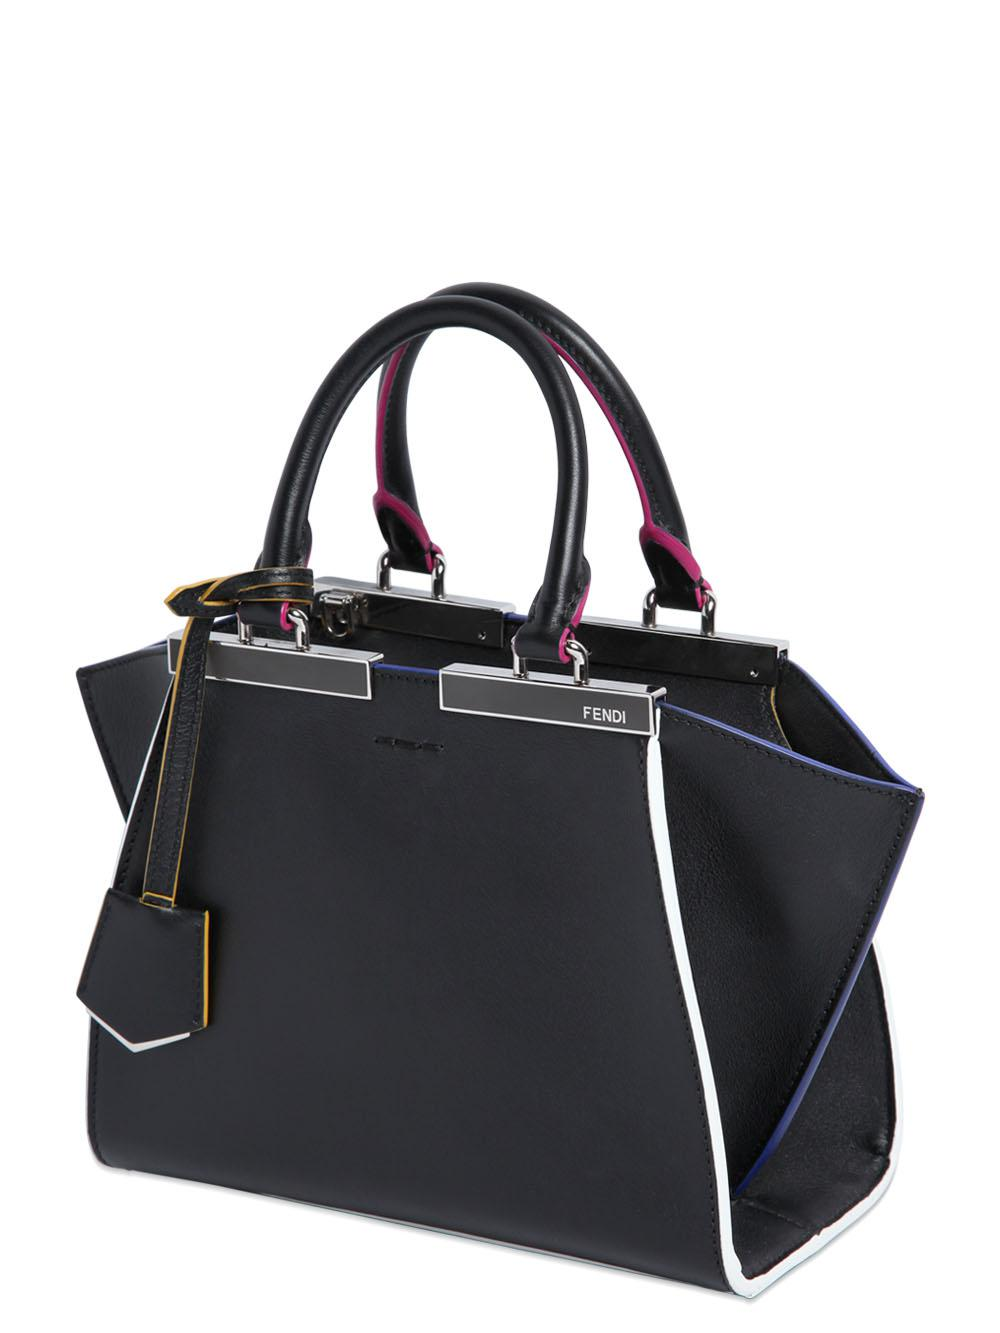 93880048373c Fendi Mini 3Jours Contrasting Edge Leather Bag in Black - Lyst